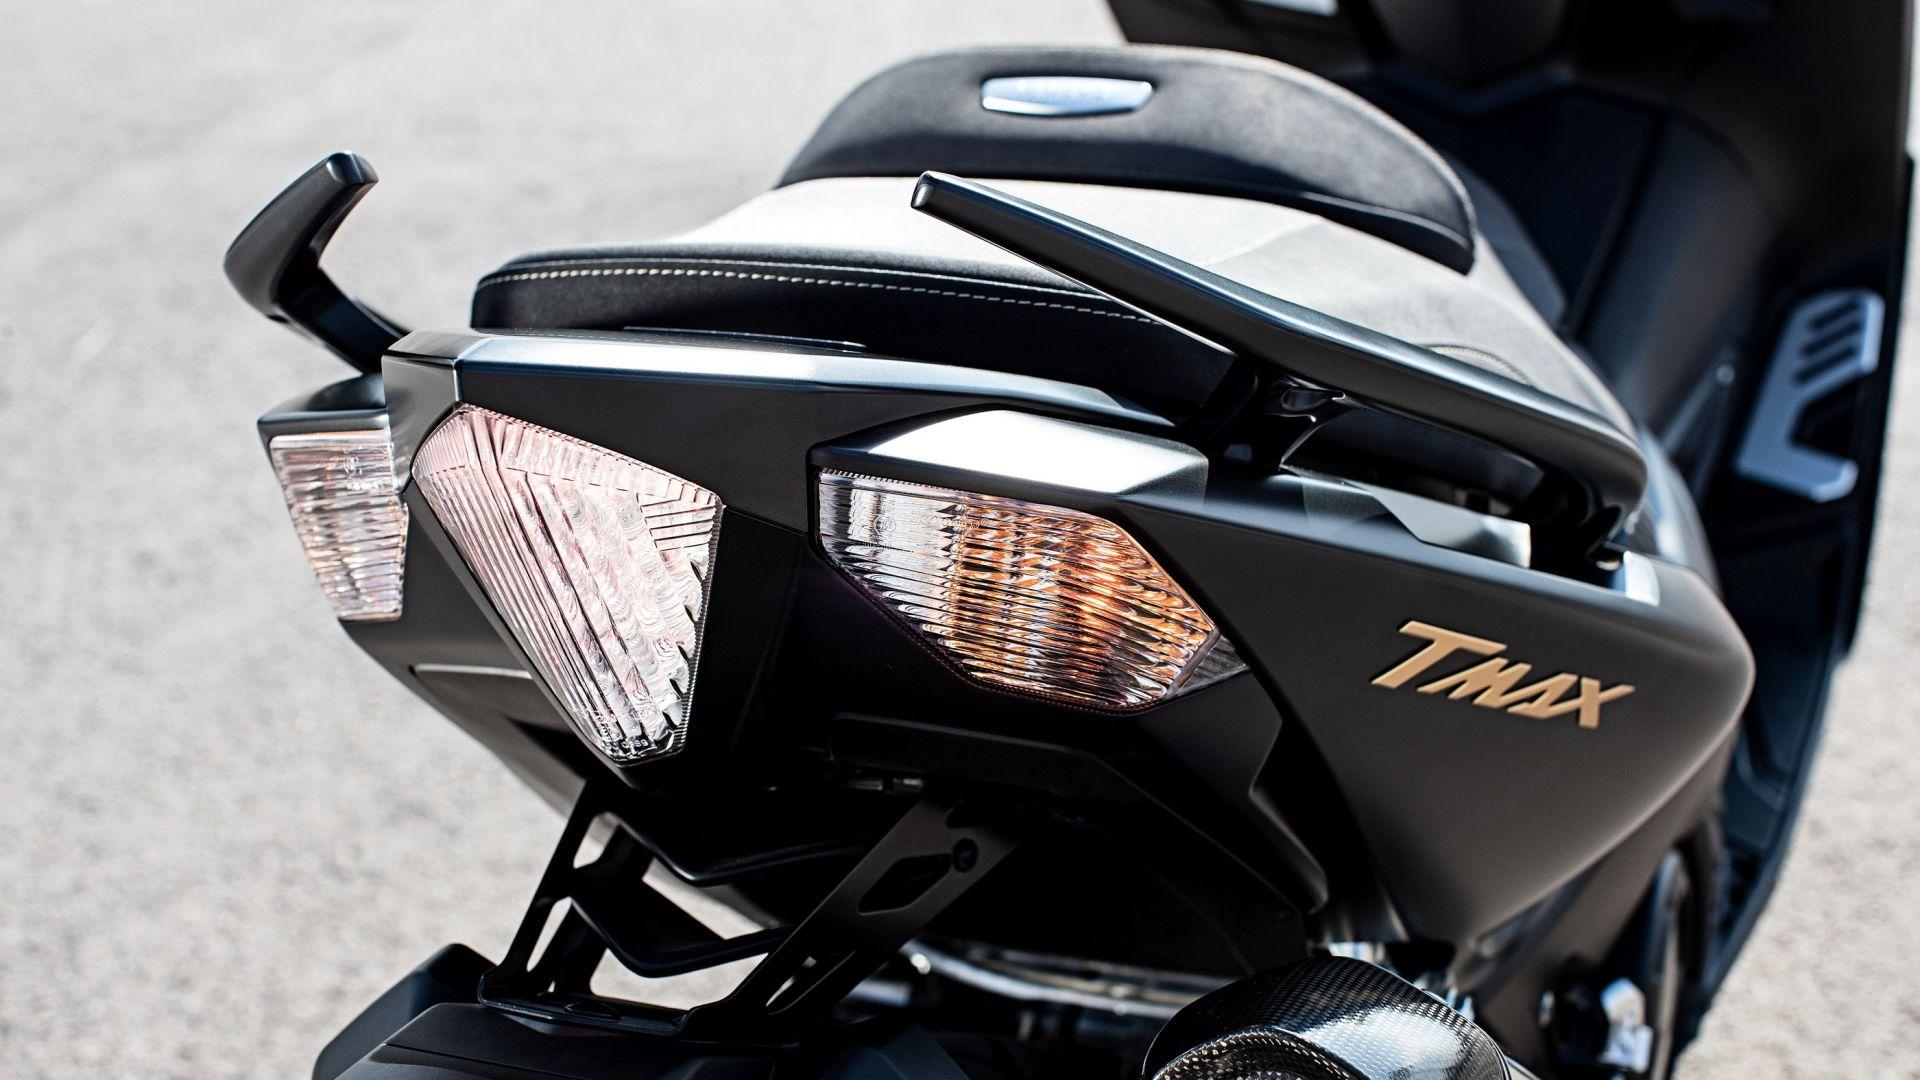 novit scooter yamaha tmax iron max 2016 motorbox. Black Bedroom Furniture Sets. Home Design Ideas